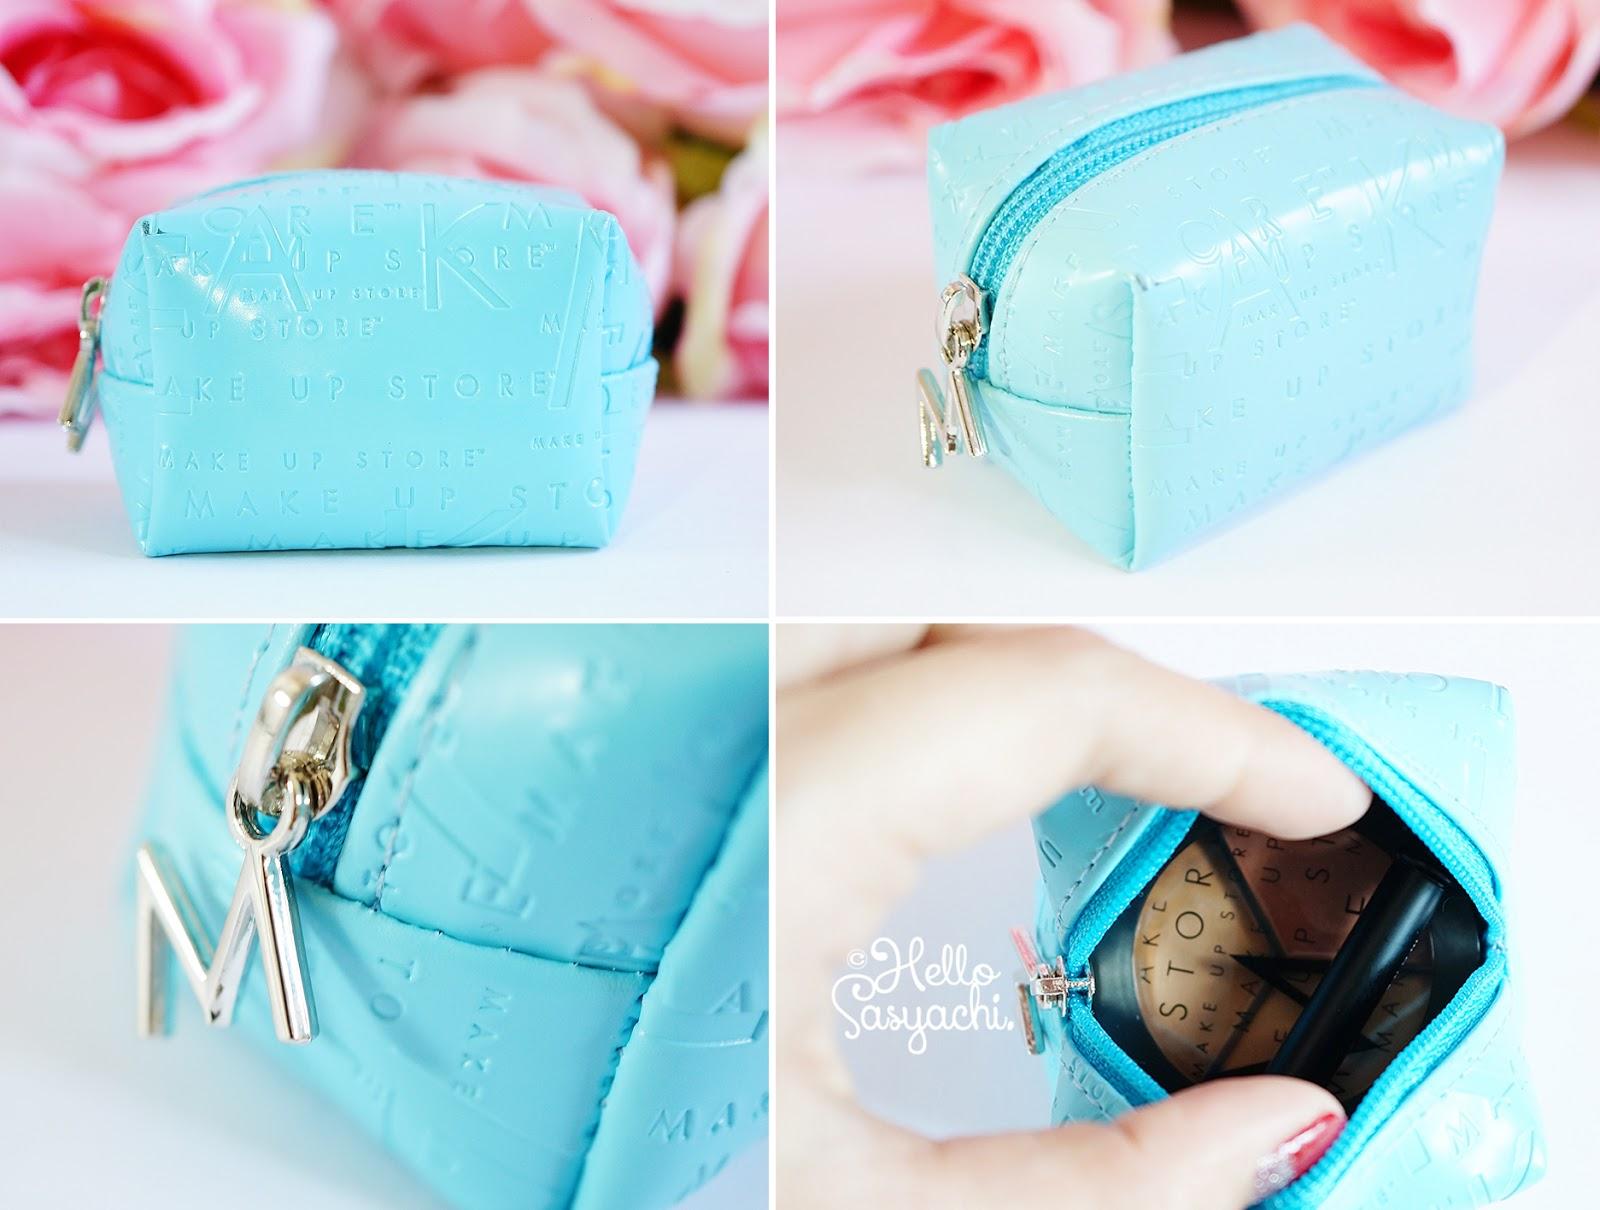 Lucunya Cover All Mix Kit ini terdapat pouch kecil yang berfungsi untuk  menyimpan concealer dan juga brush nya. Di Makeup Store ada 2 warna yakni  Biru dan ... ad6d0cf2c11a7